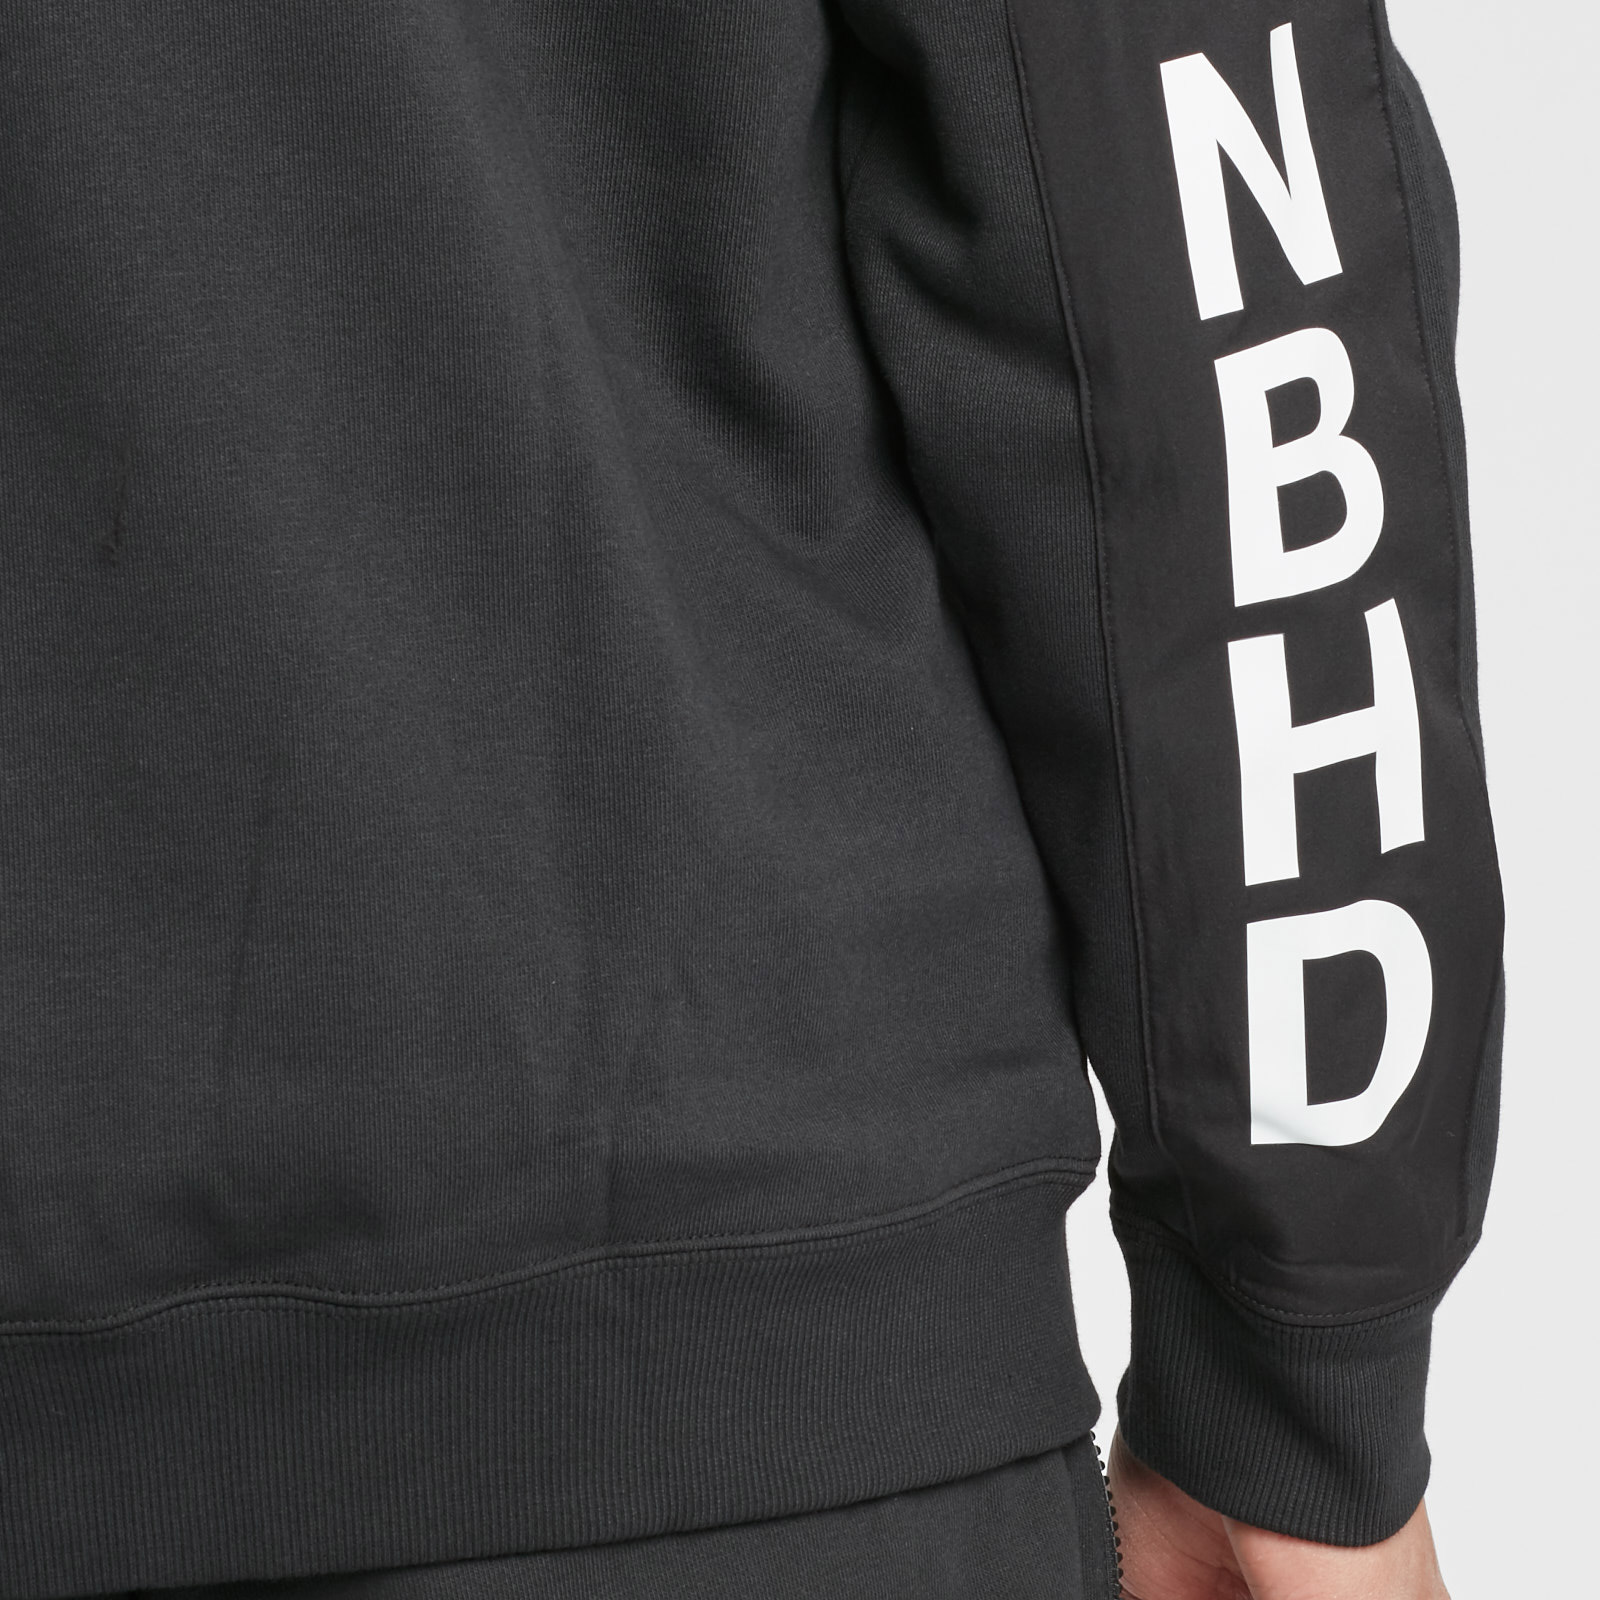 e6bbe243 adidas Commander Sweater x Neighborhood - Cd7734 - Sneakersnstuff ...